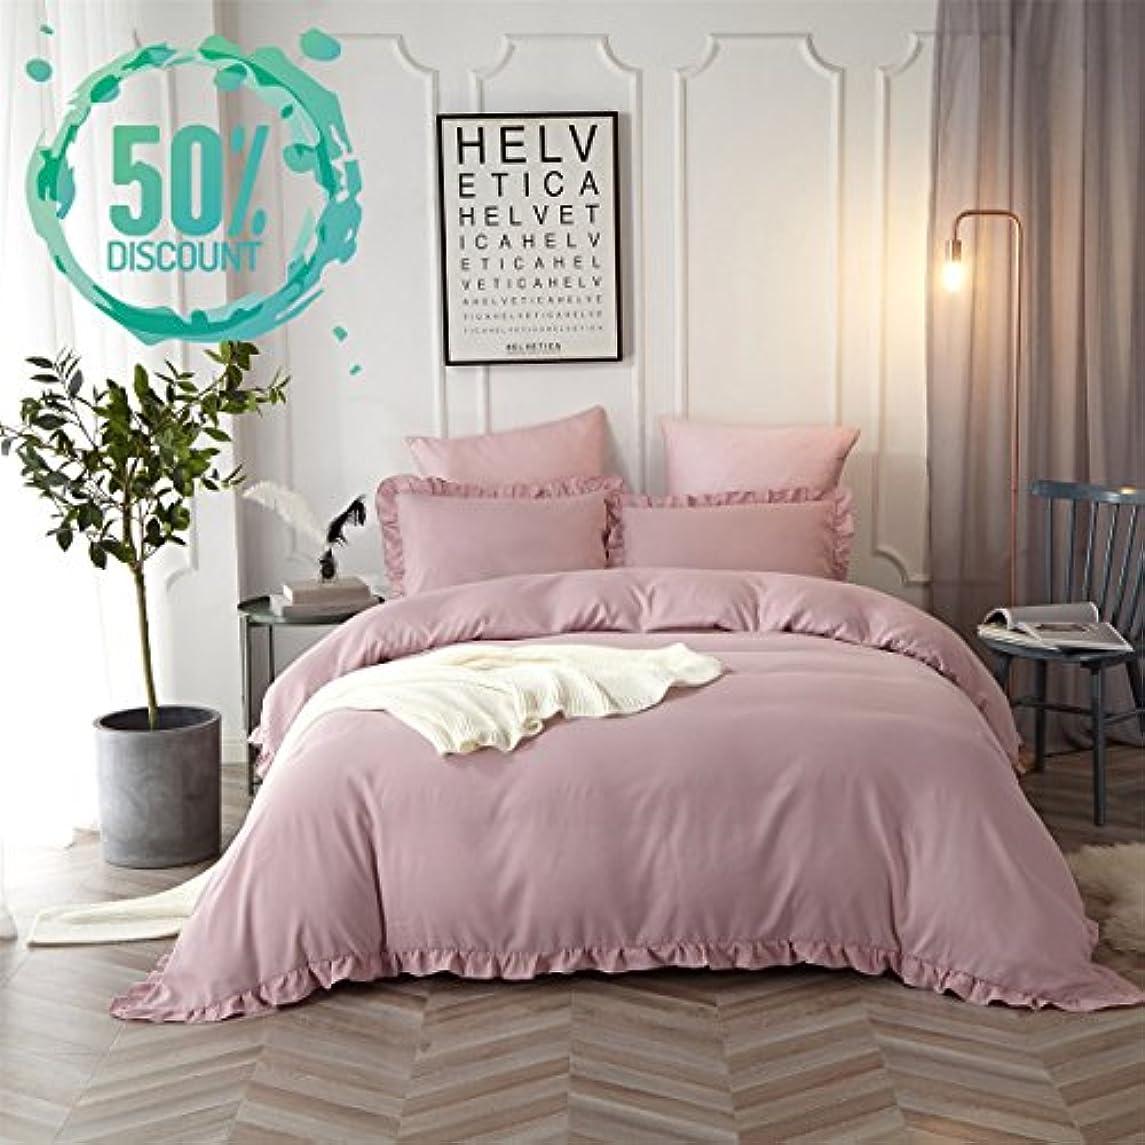 Hyprest Lace Duvet Cover Set Queen Lightweight Soft Solid Color 3PC Bedding Exquisite Flouncing, Blush